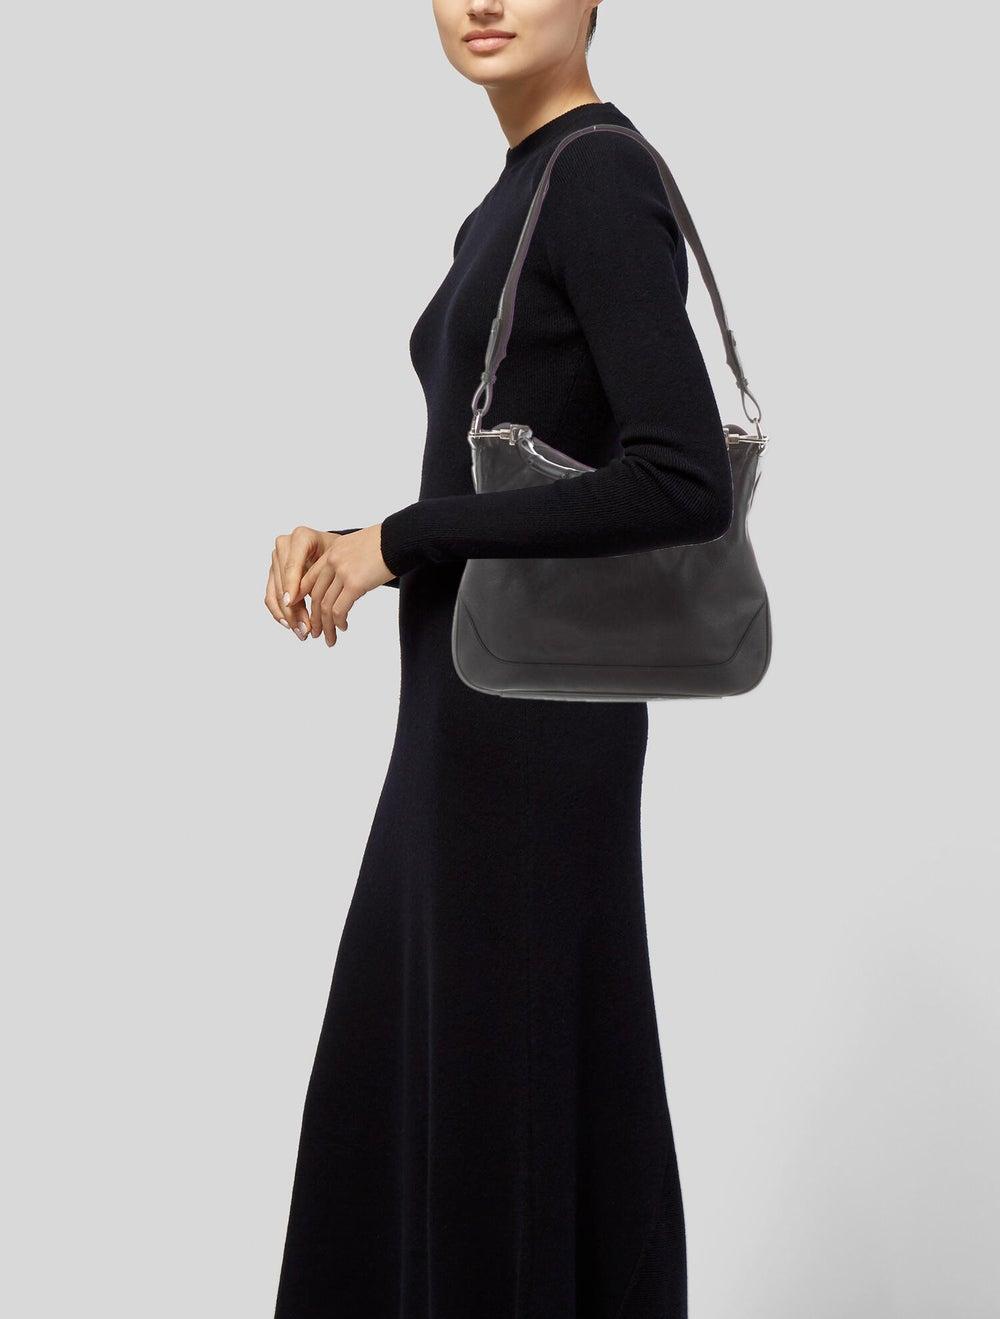 Gucci Vintage Leather Bamboo Handle Bag Black - image 2